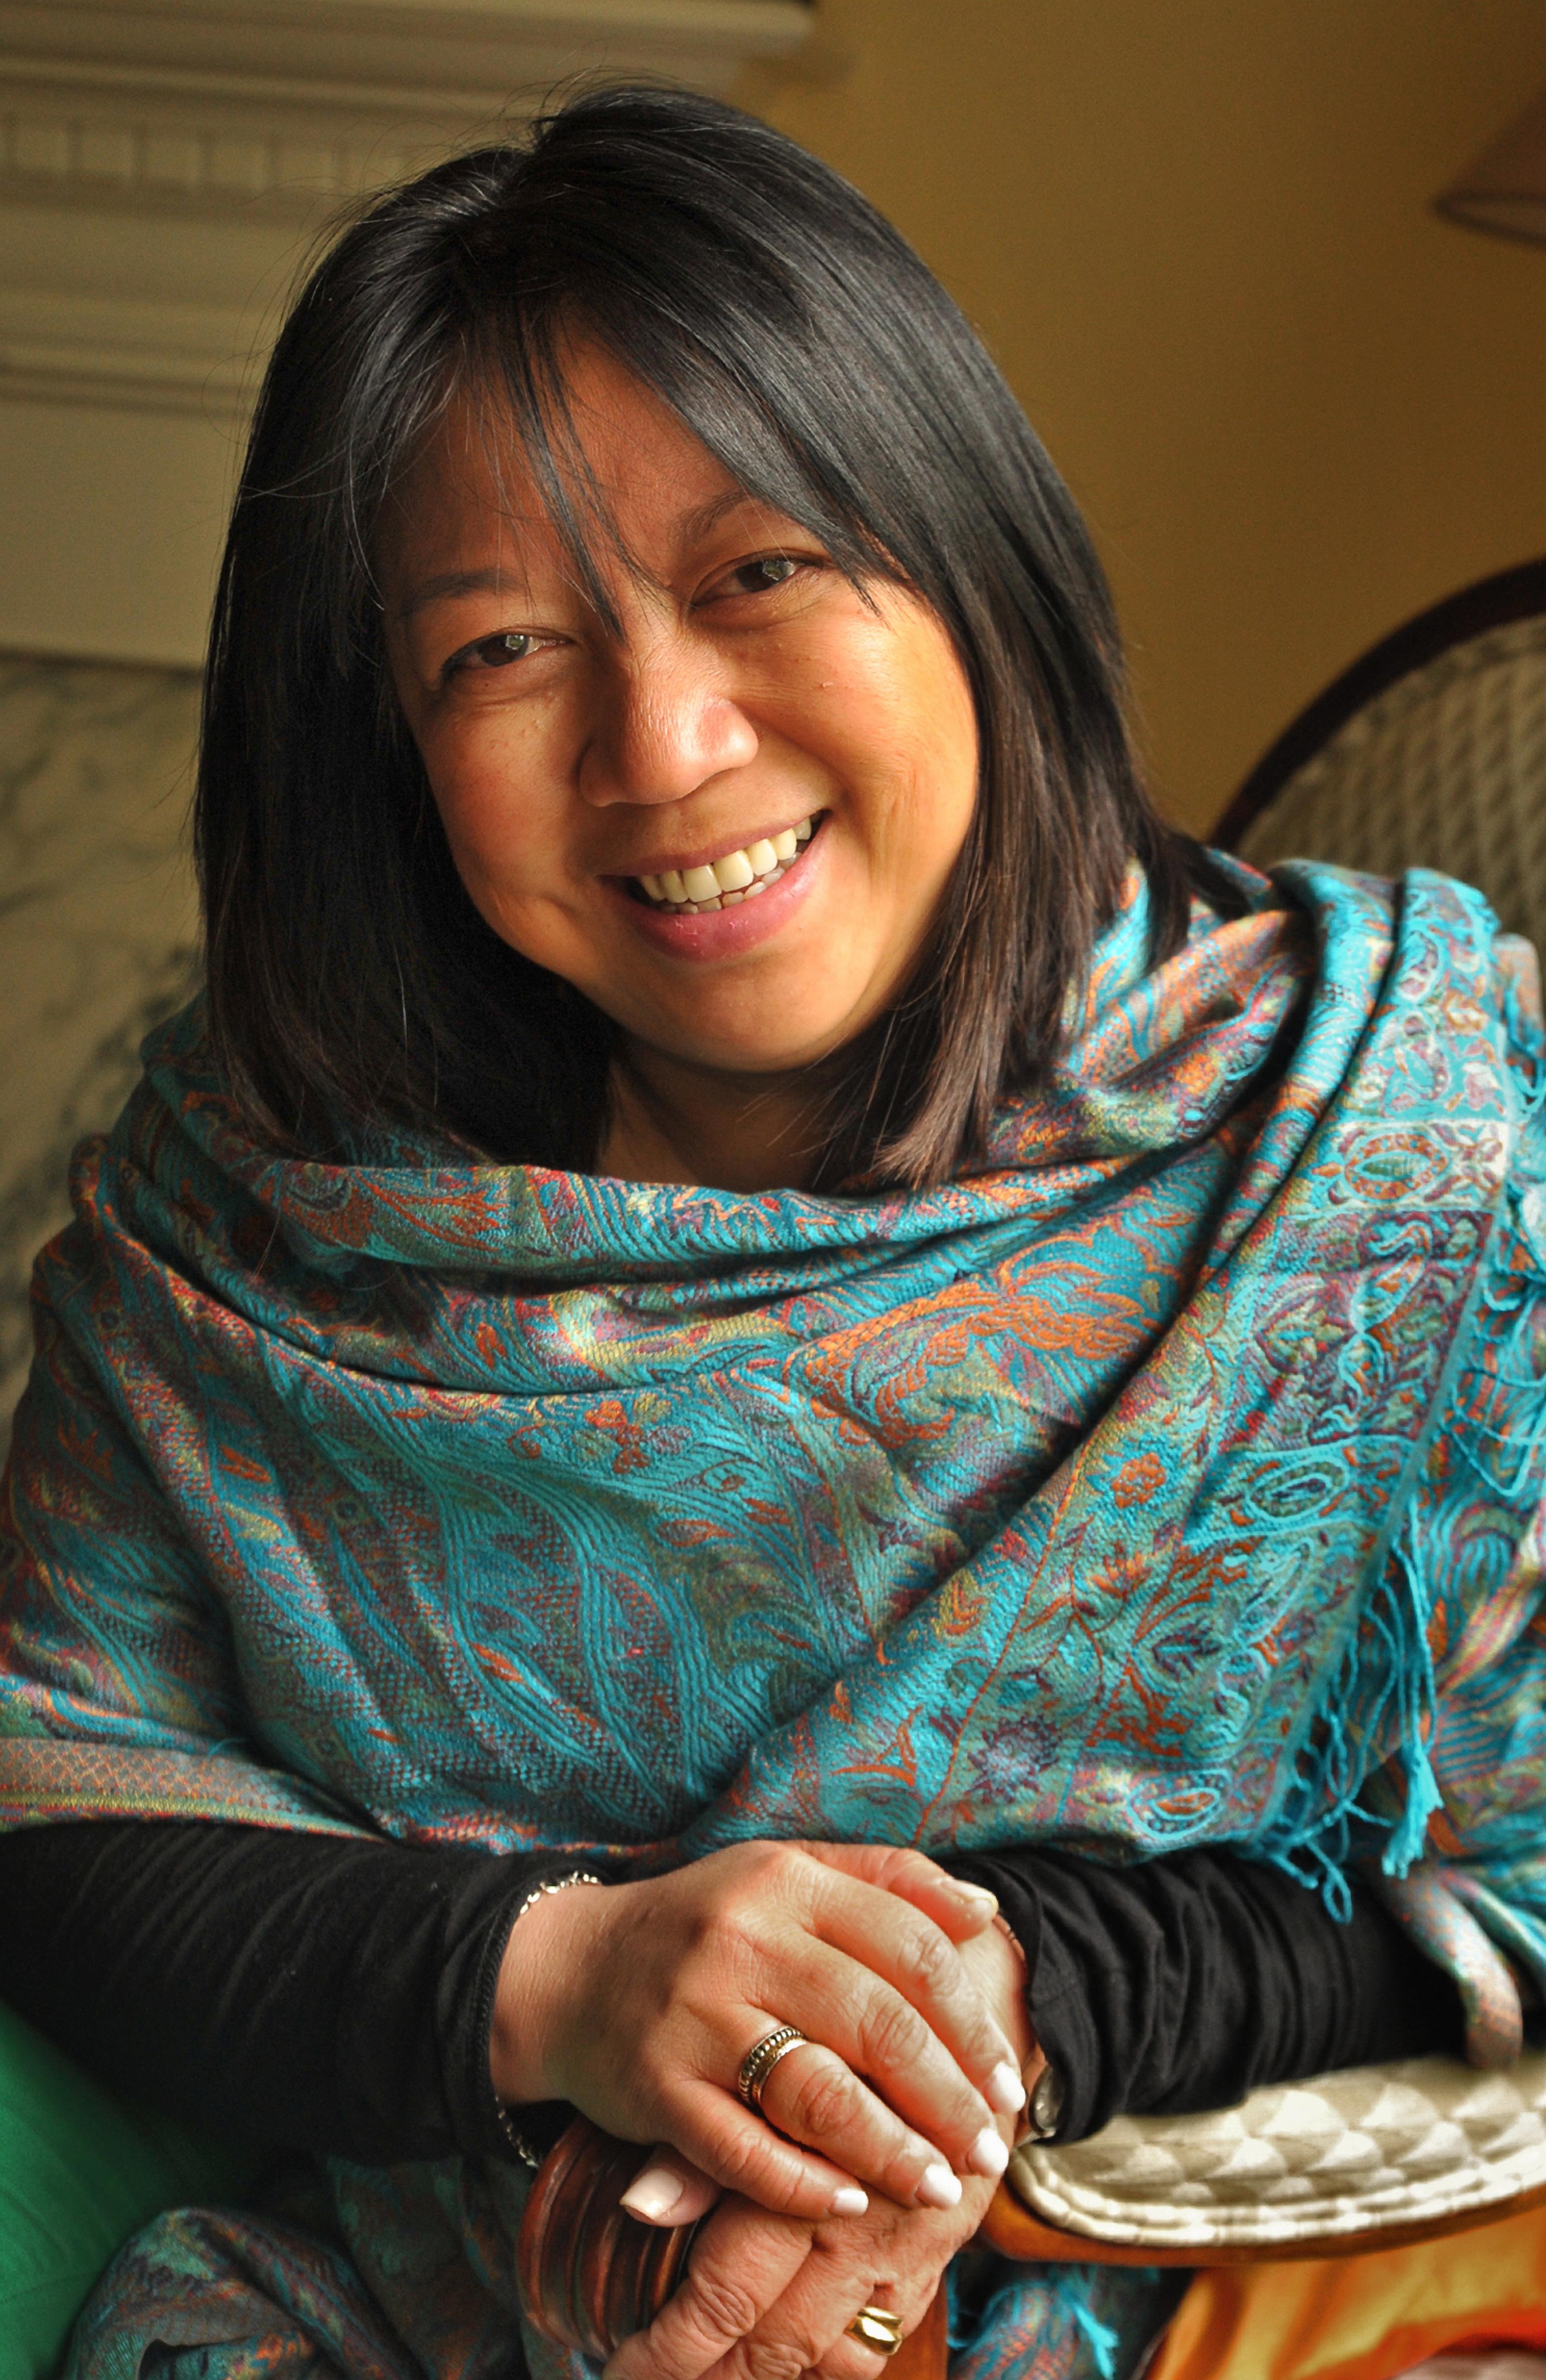 Filmmaker Ramona Diaz. Photo courtesy of the filmmaker.